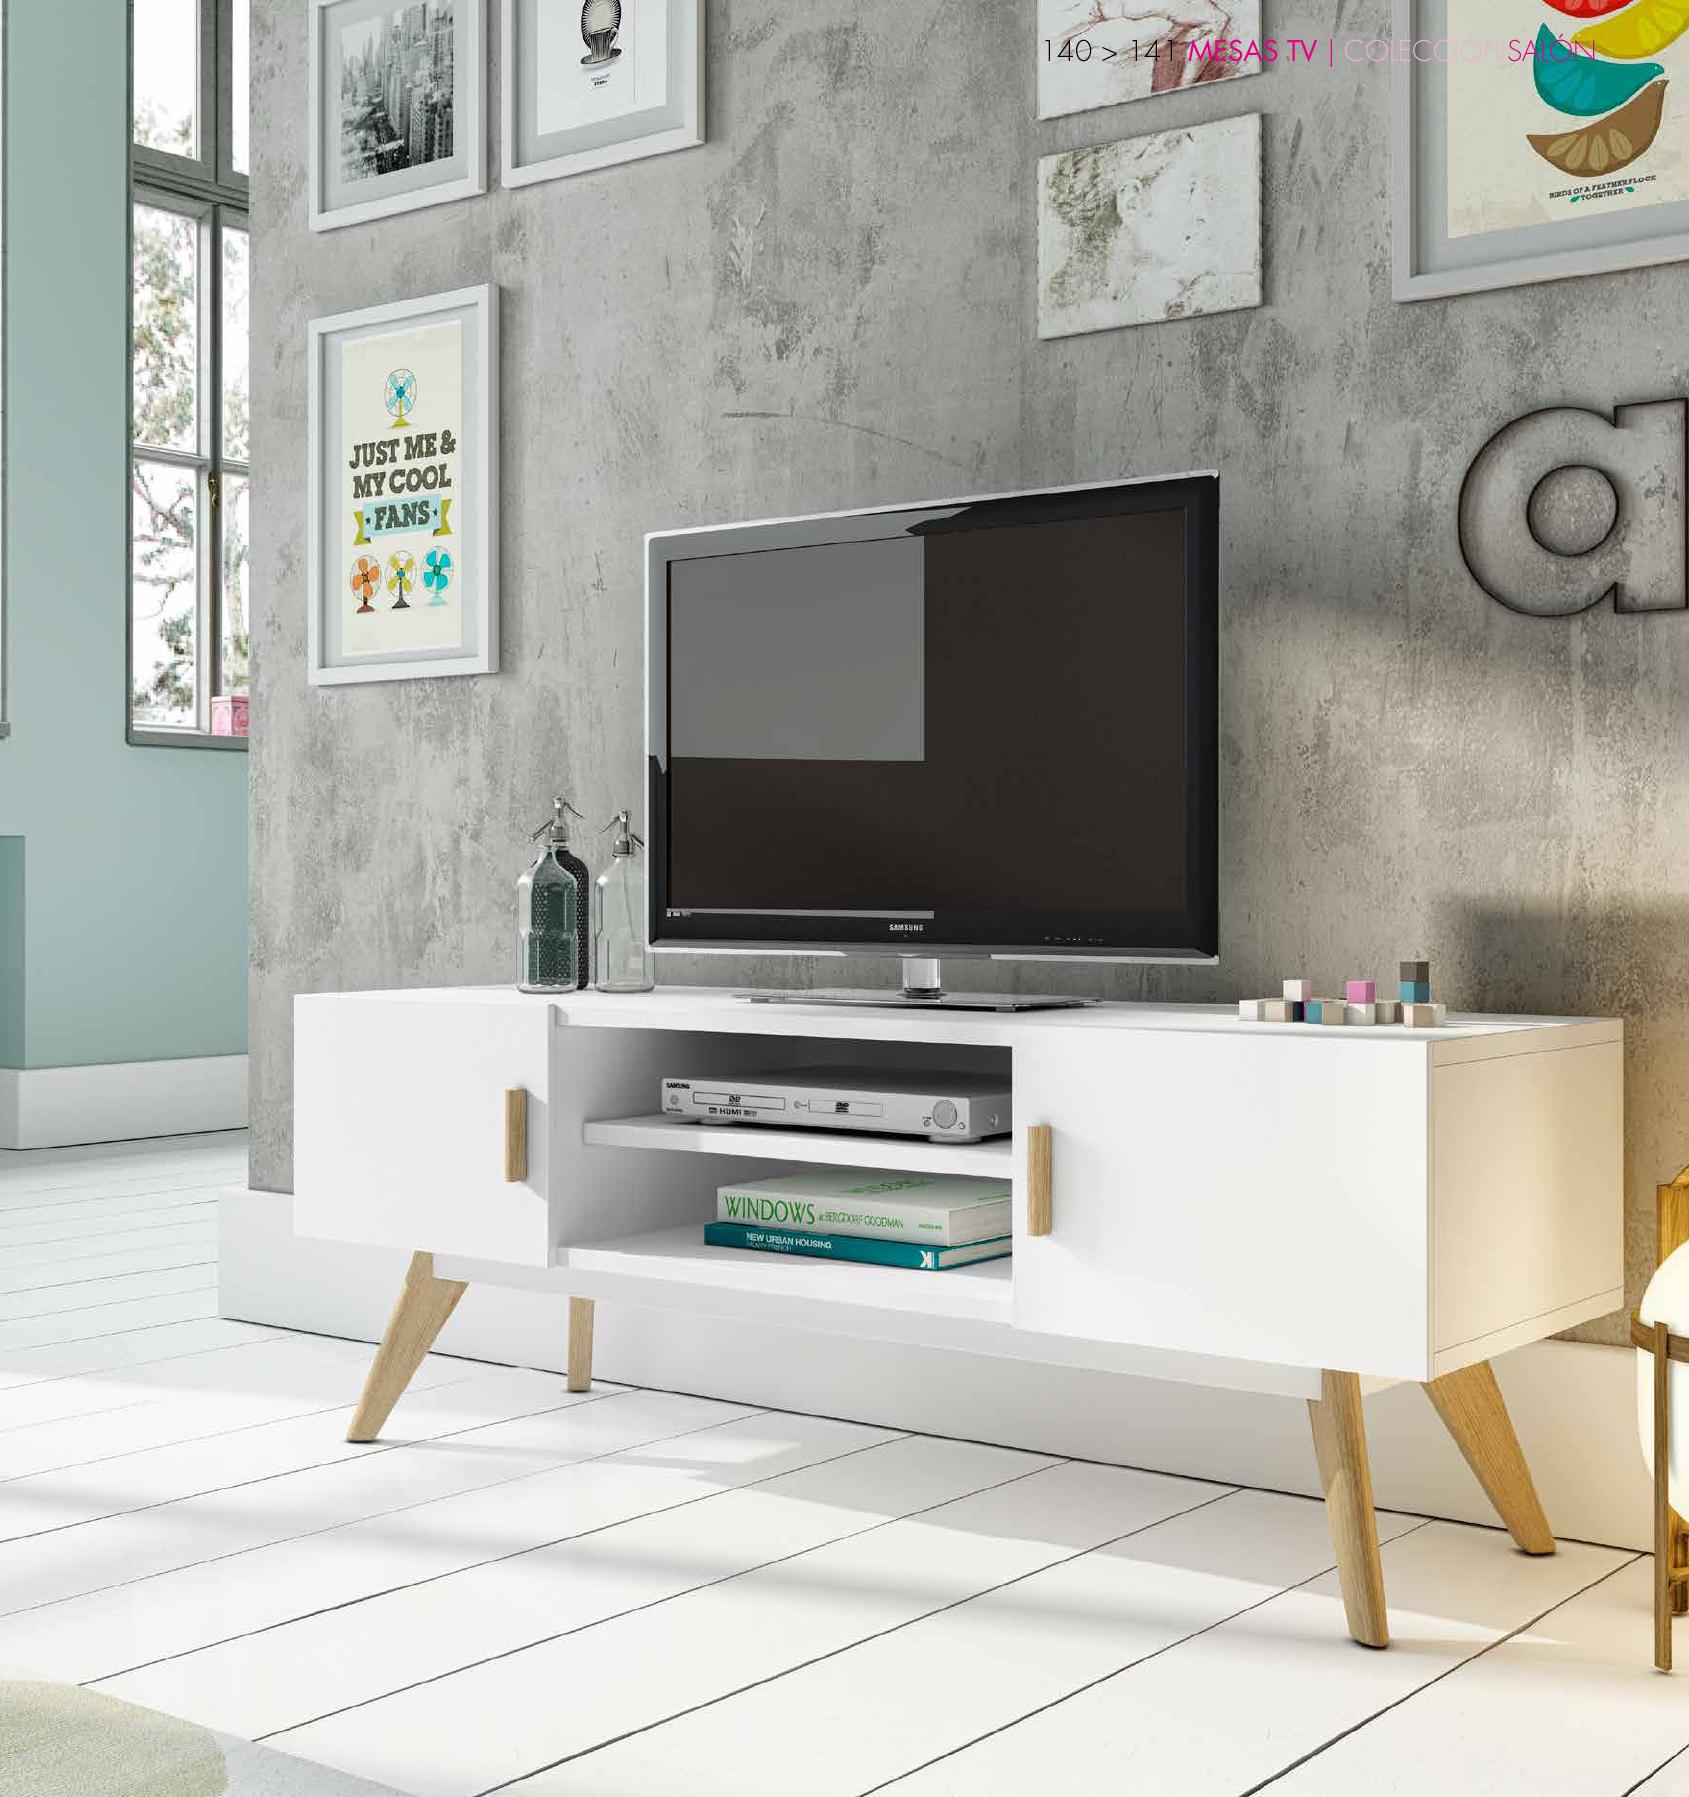 Envíos gratis a toda España) Mueble para TV estilo nórdico vintage ...